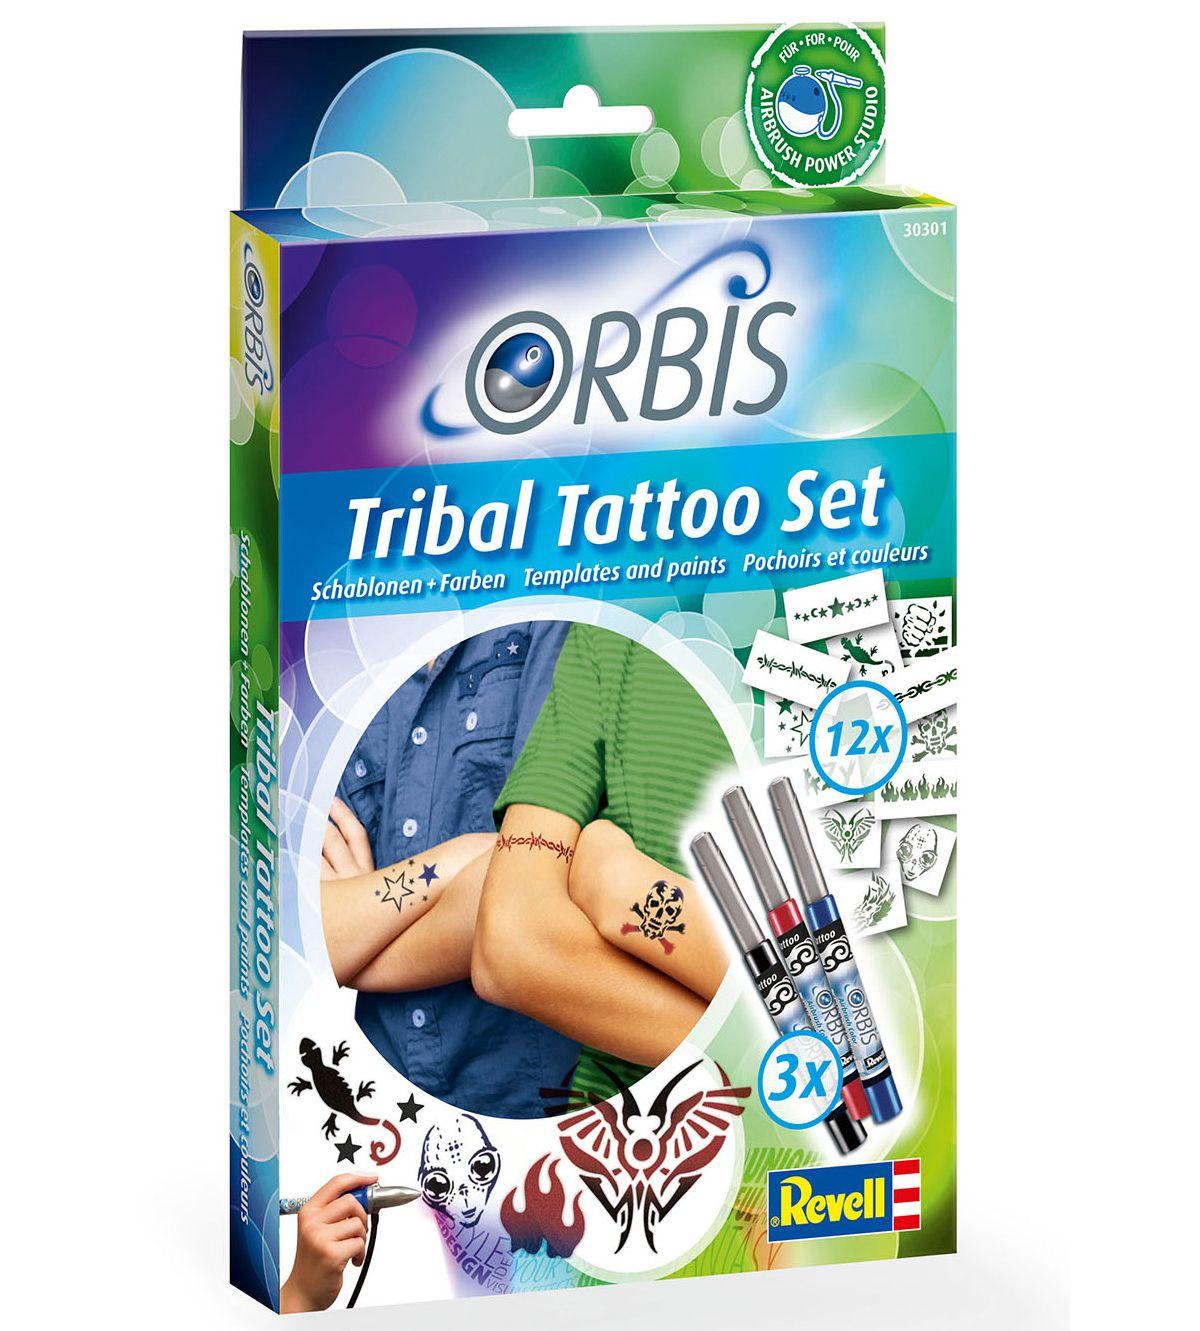 Revell® Airbrush Tattoo Studio, »Orbis Tribal T...